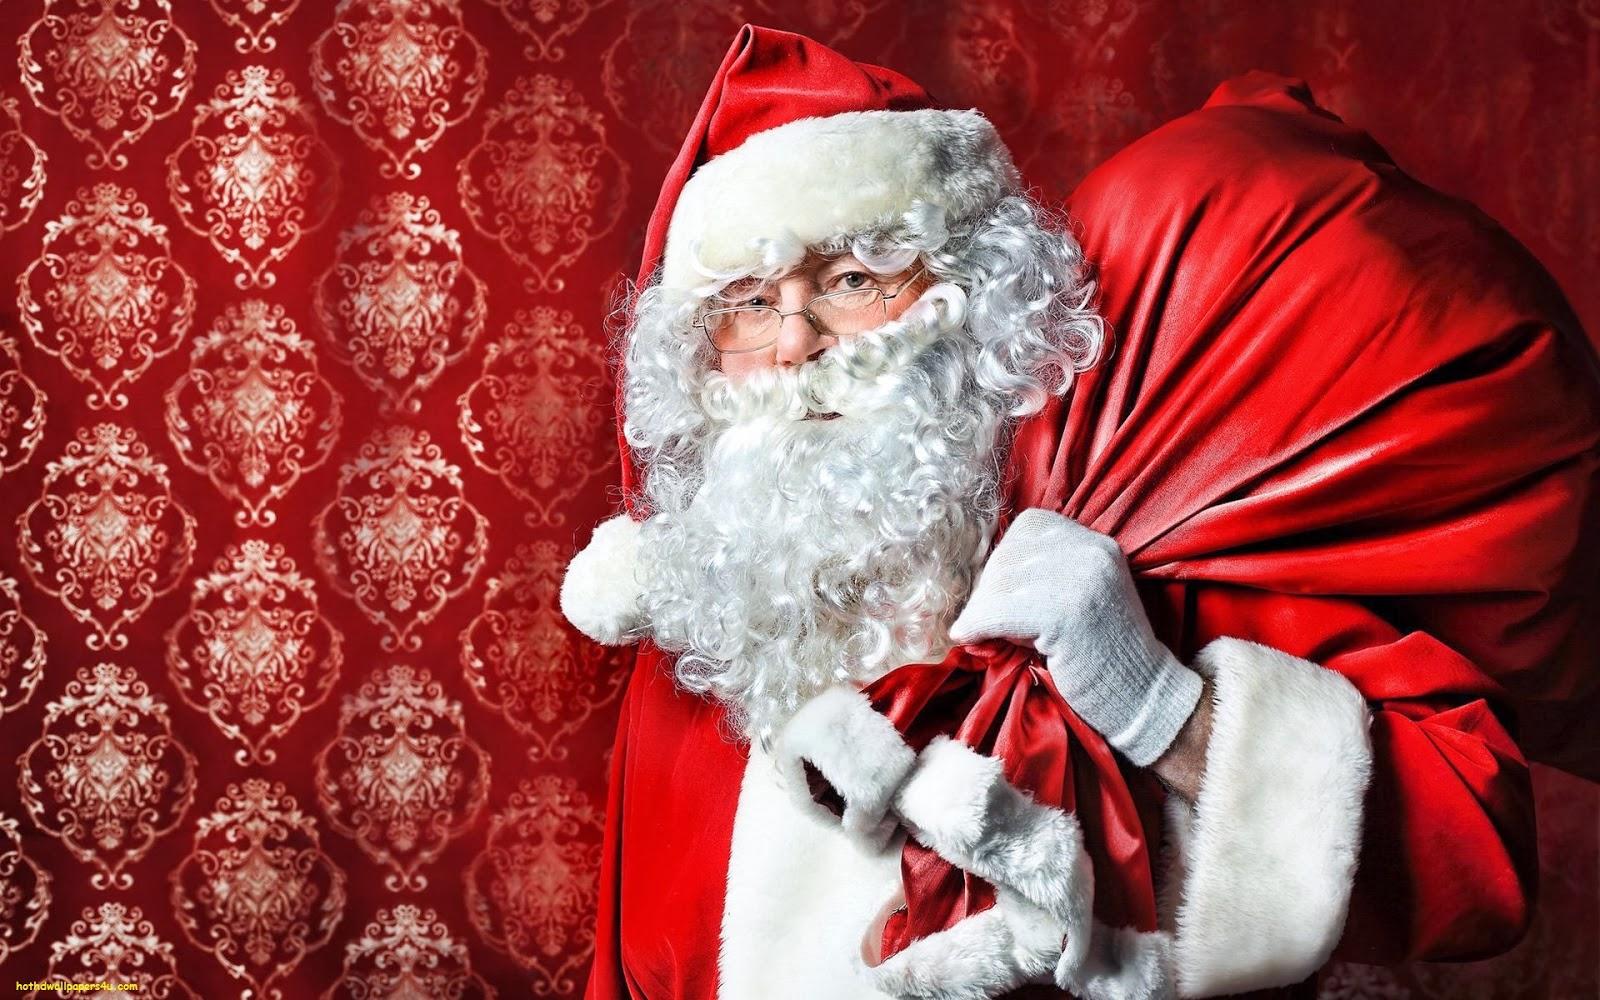 hd wallpapers santa claus wallpapers free download